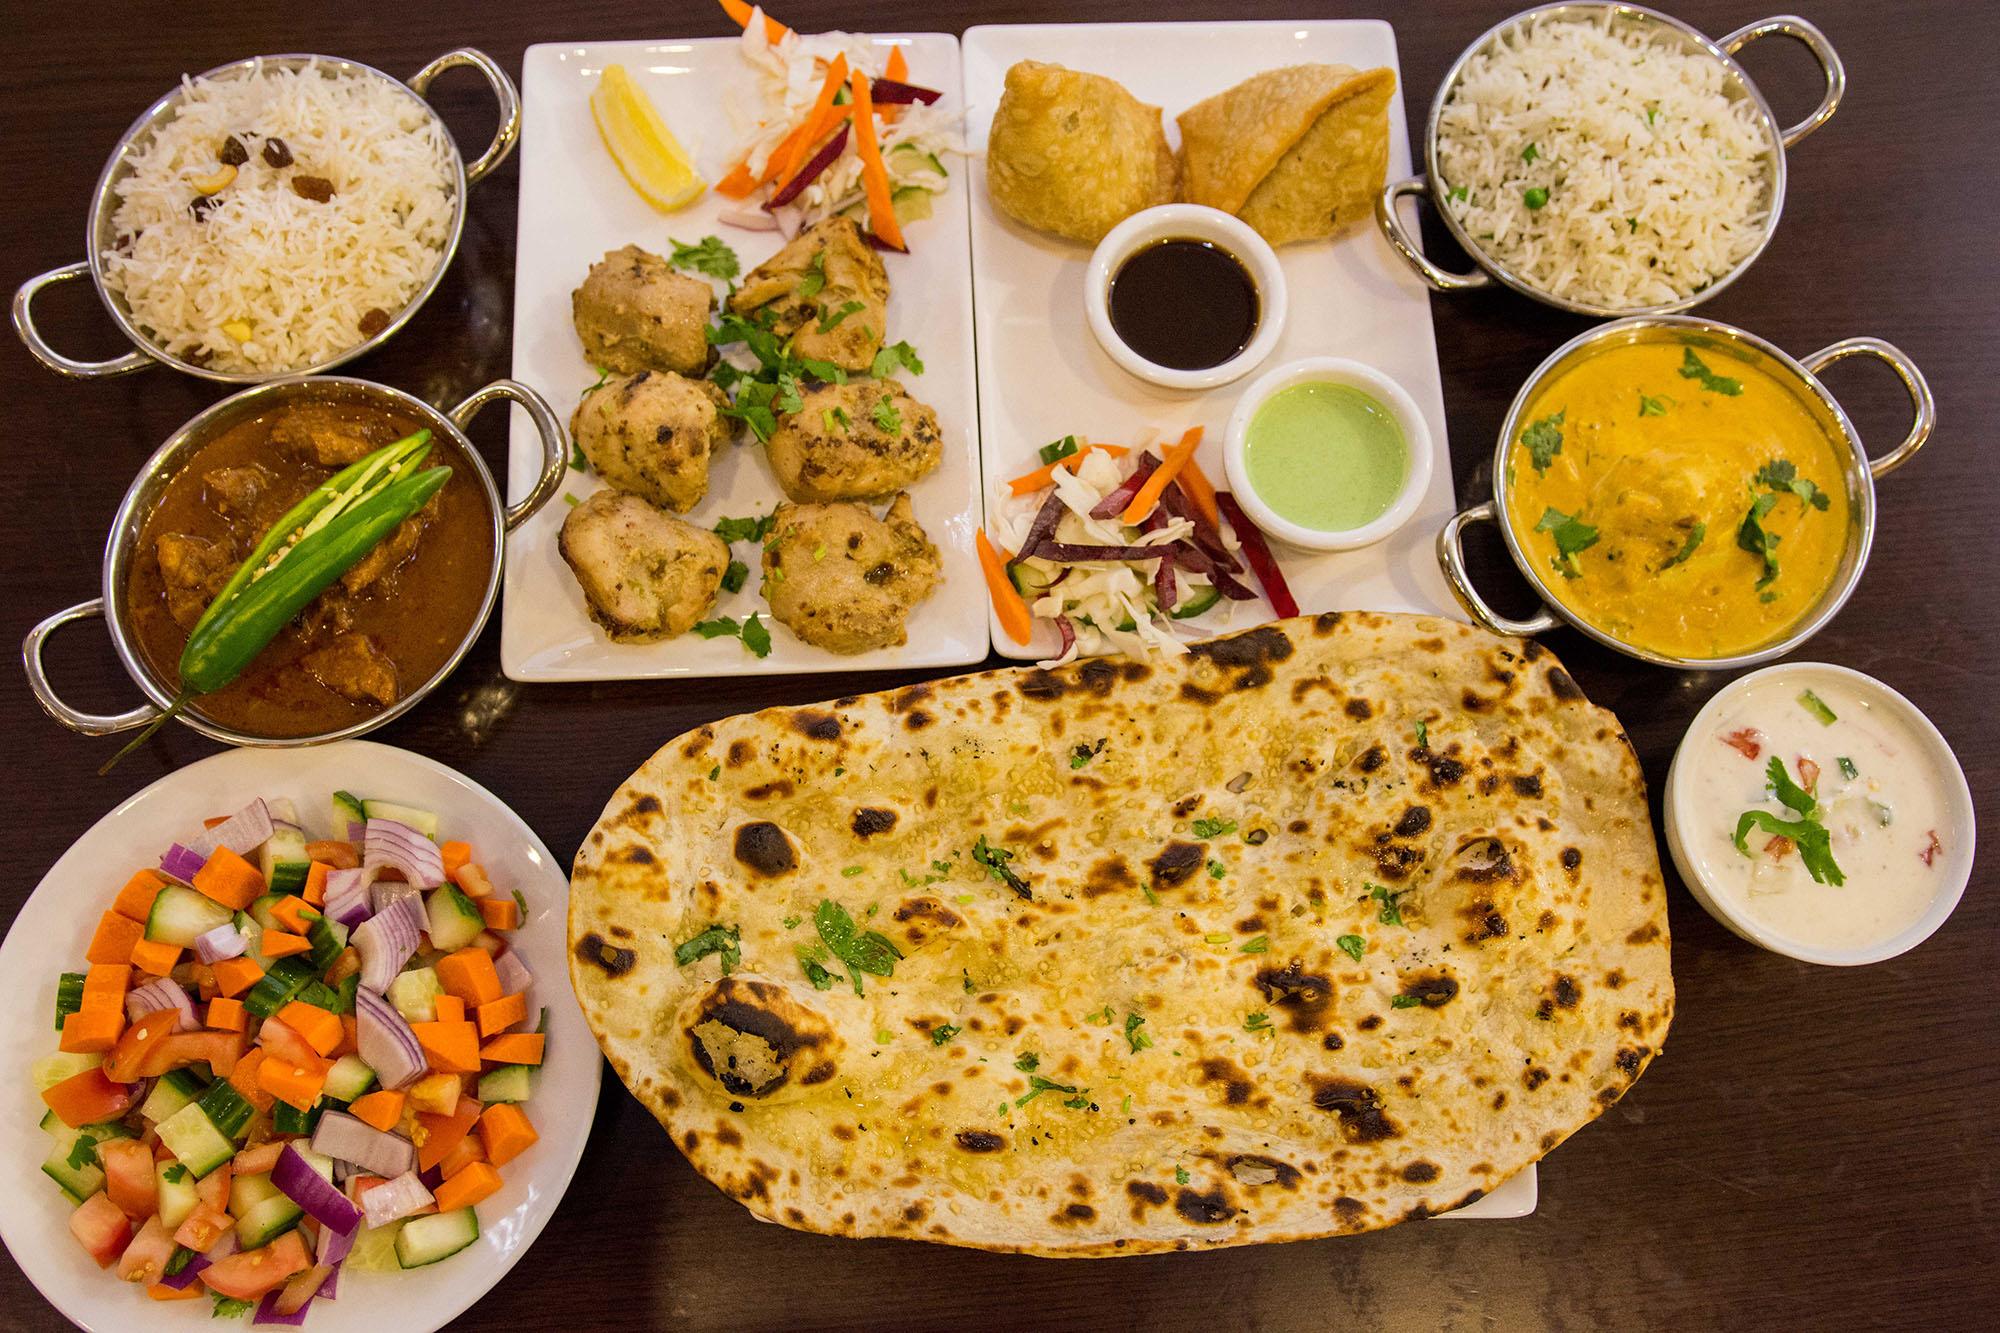 Best Indian Food Restaurants | Indian Food Delivery Restaurants Near Me